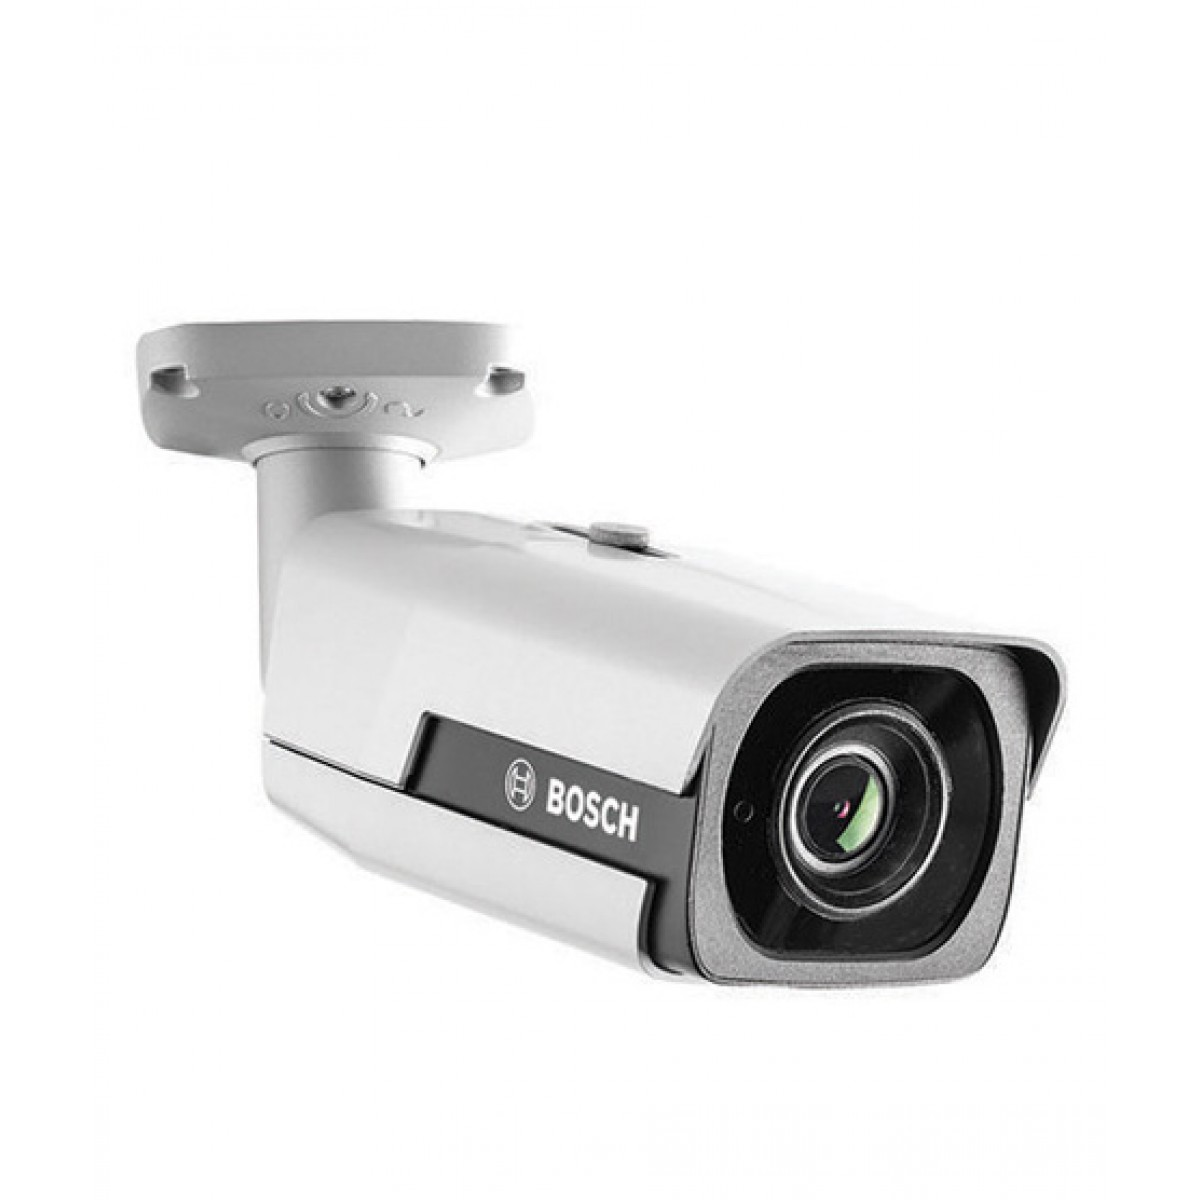 Bosch DINION IP Bullet 4000 720p IR Camera NTI-40012-A3